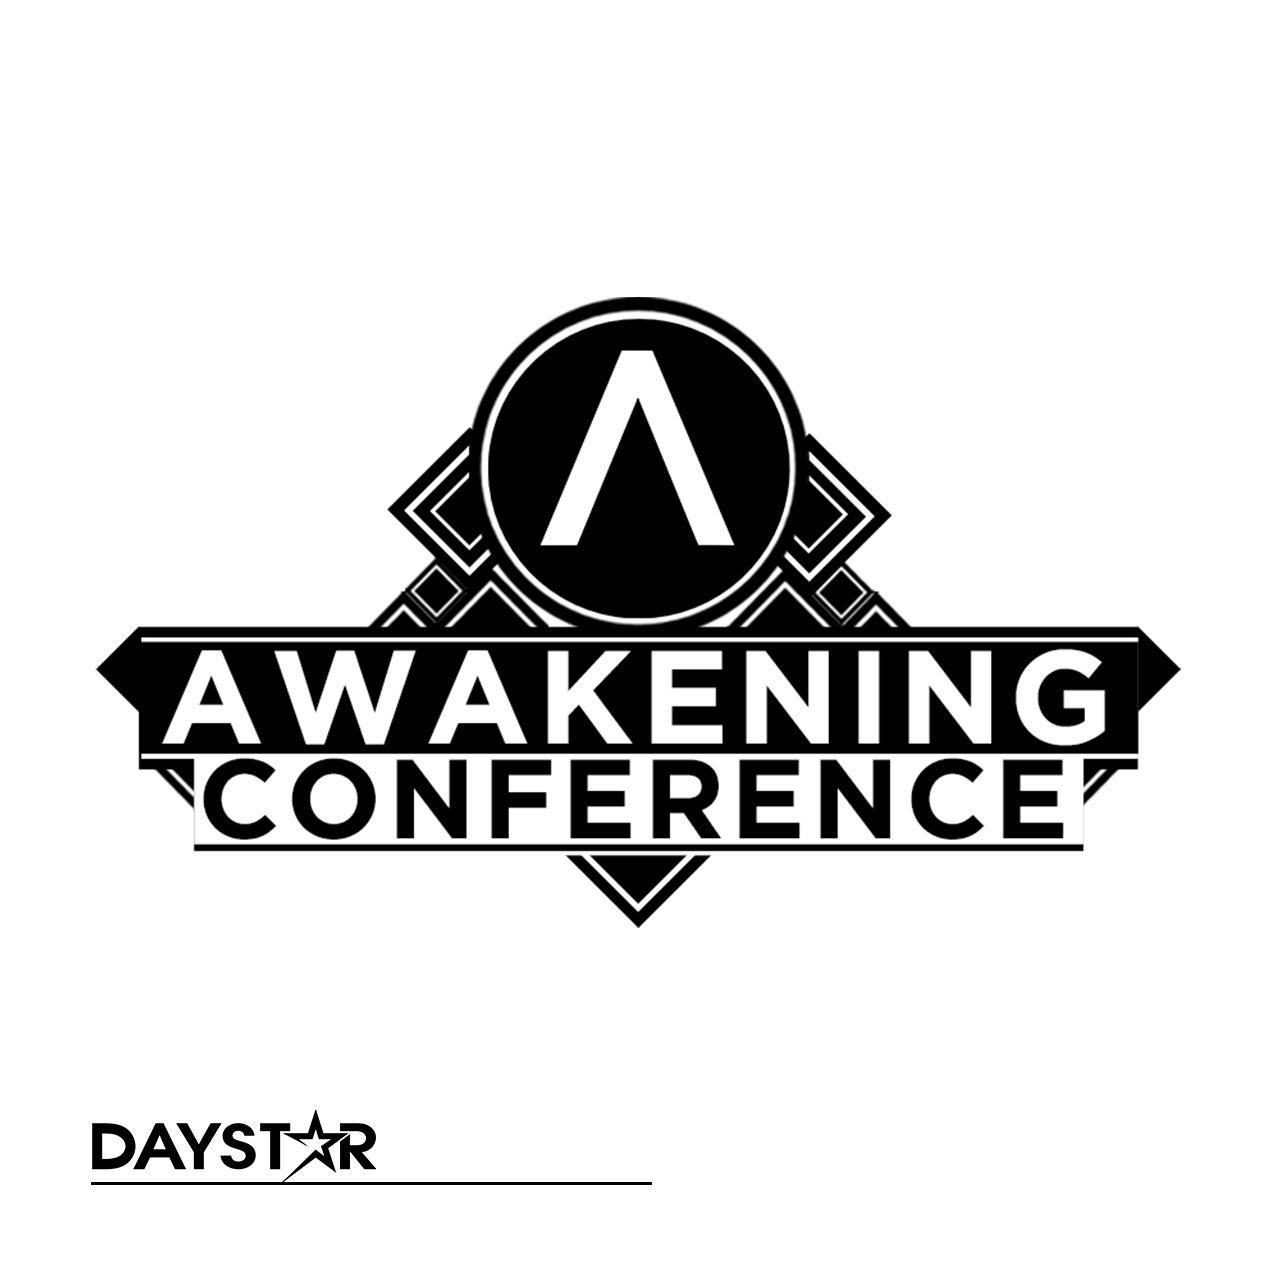 Awakening 2016 Set to Broadcast on Daystar